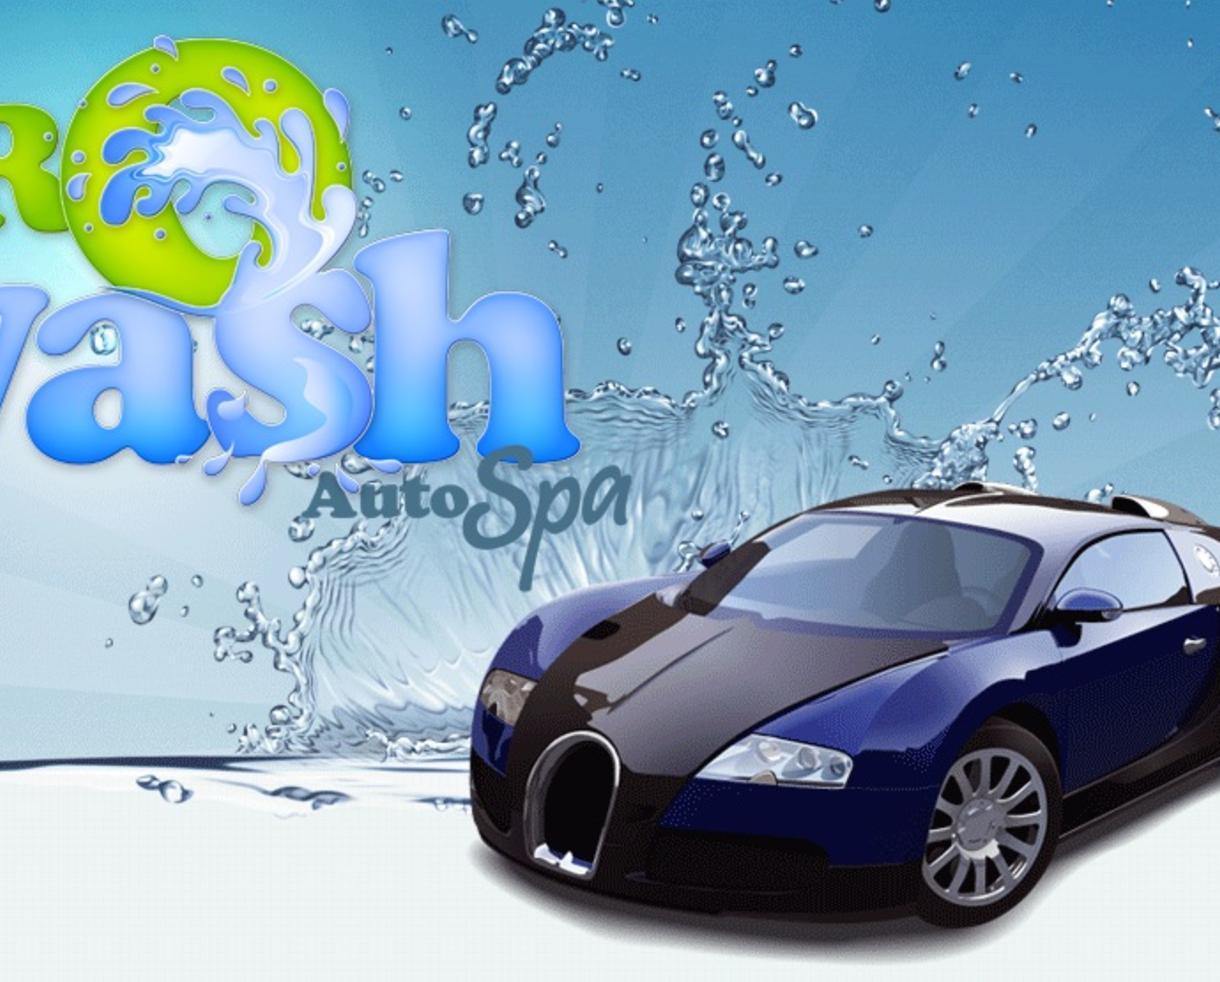 Full Service Car Wash Dallas Ga